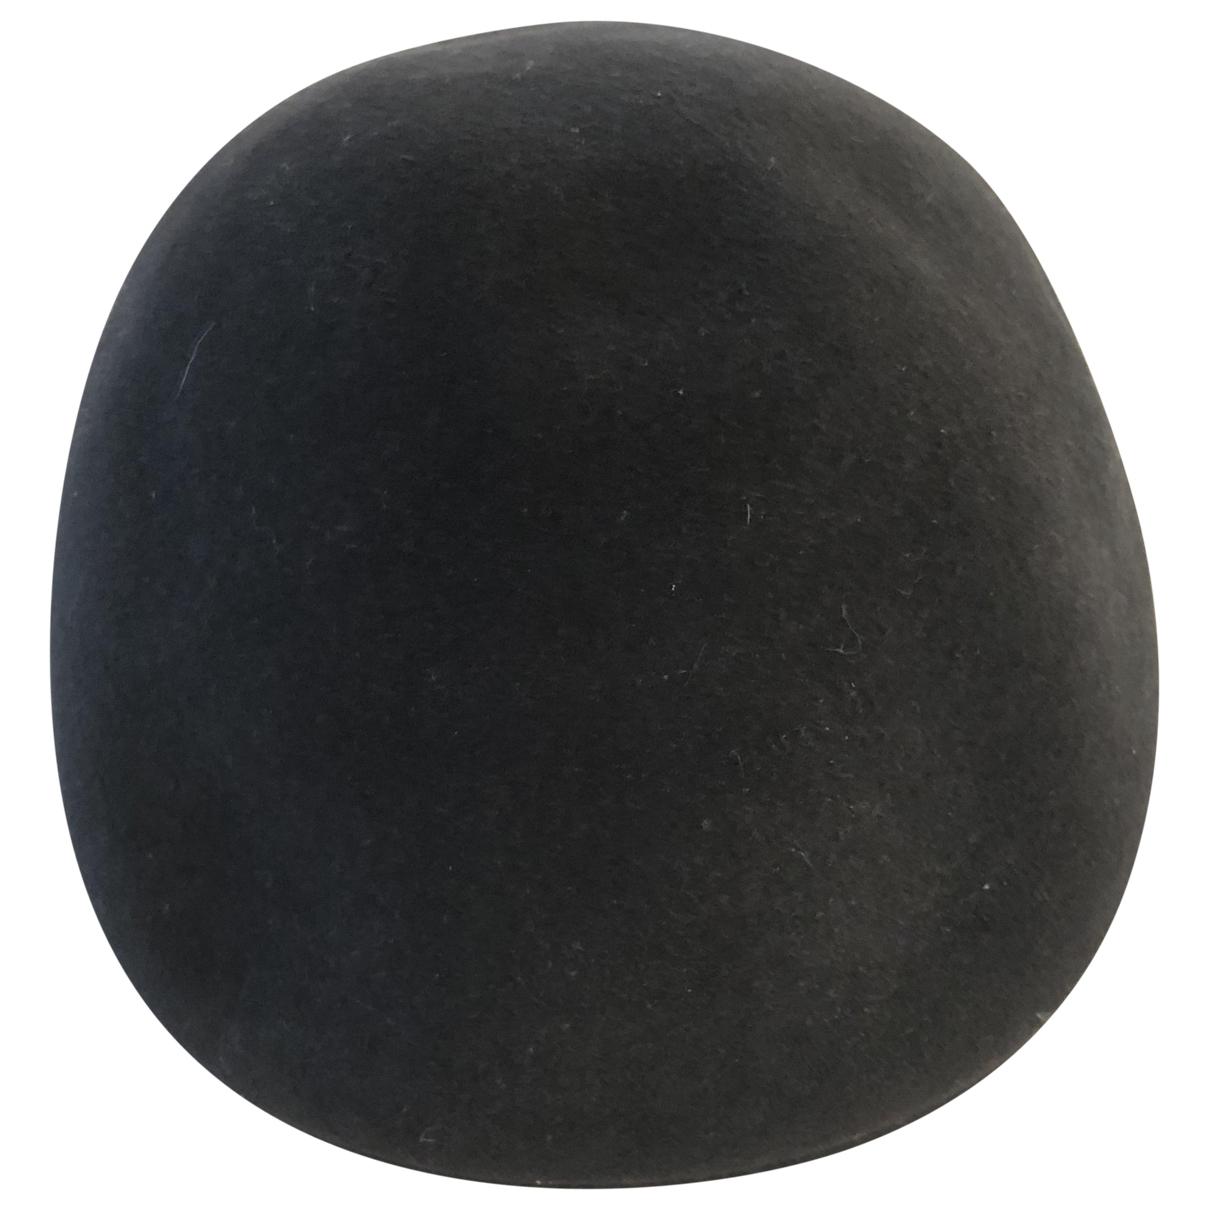 Borsalino \N Anthracite Wool hat & pull on hat for Men 59 cm